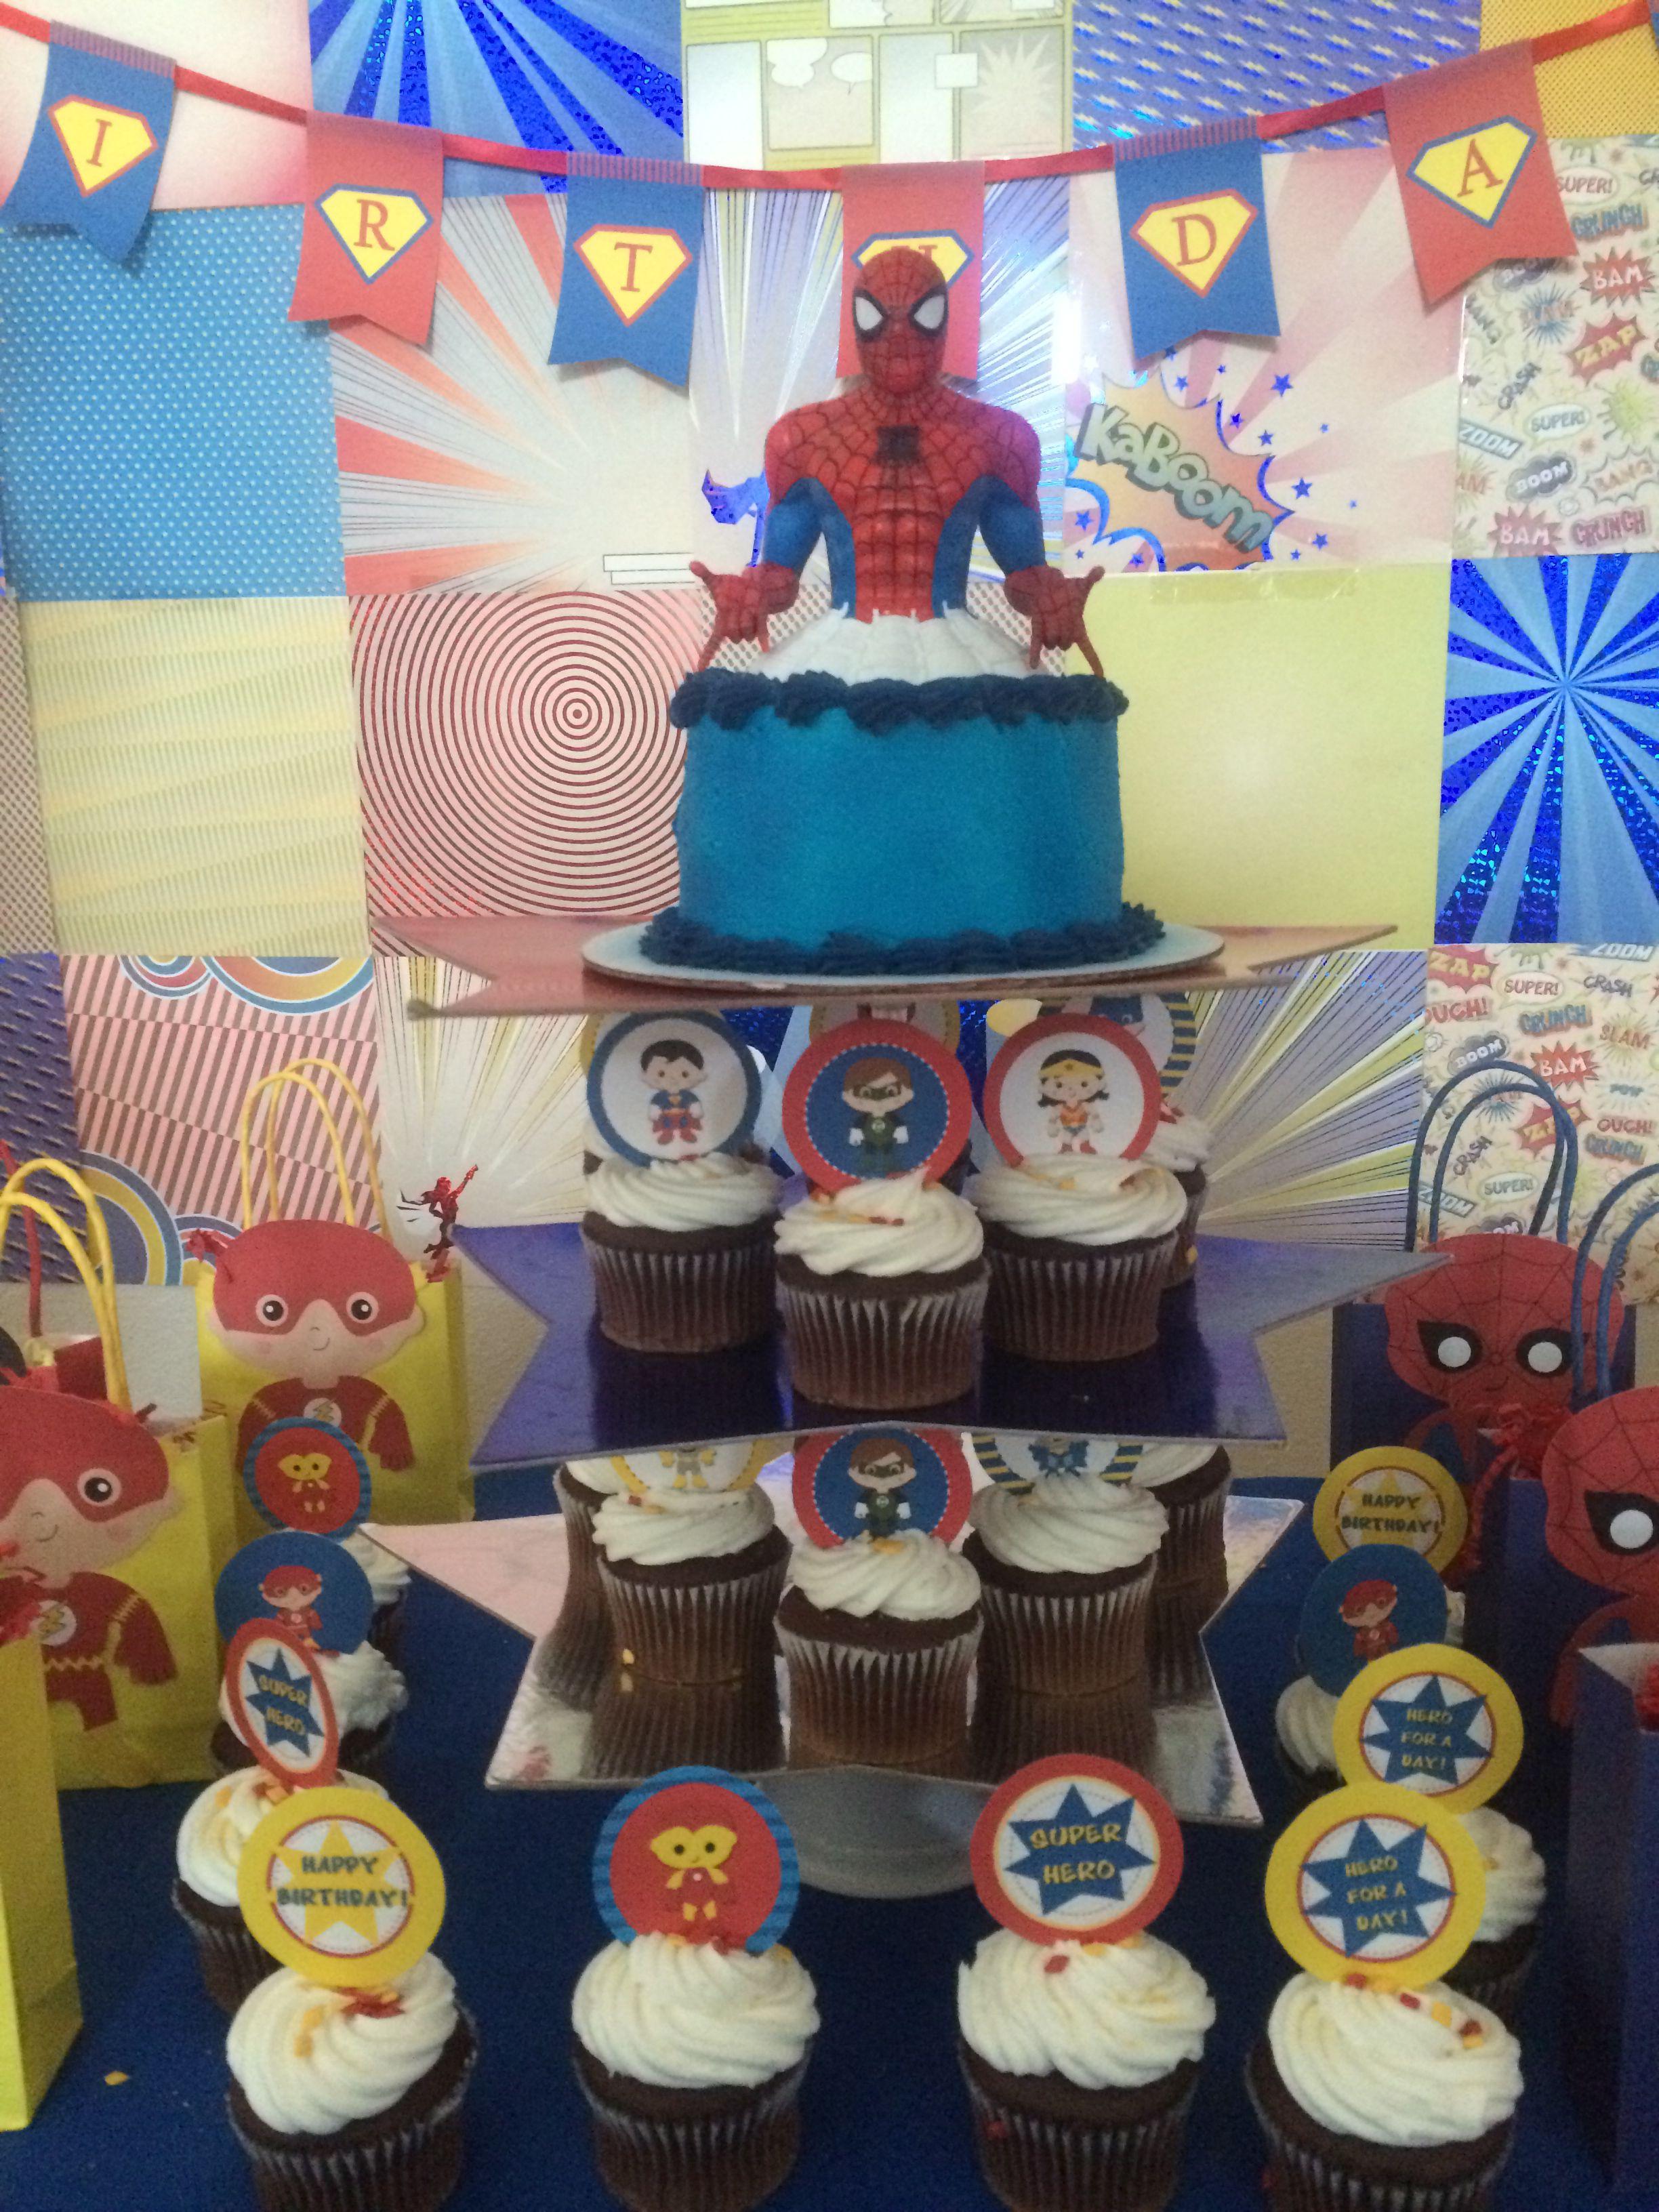 Superhero Cupcake Tower Bust Bank 5 At Walmart For The Top Cake